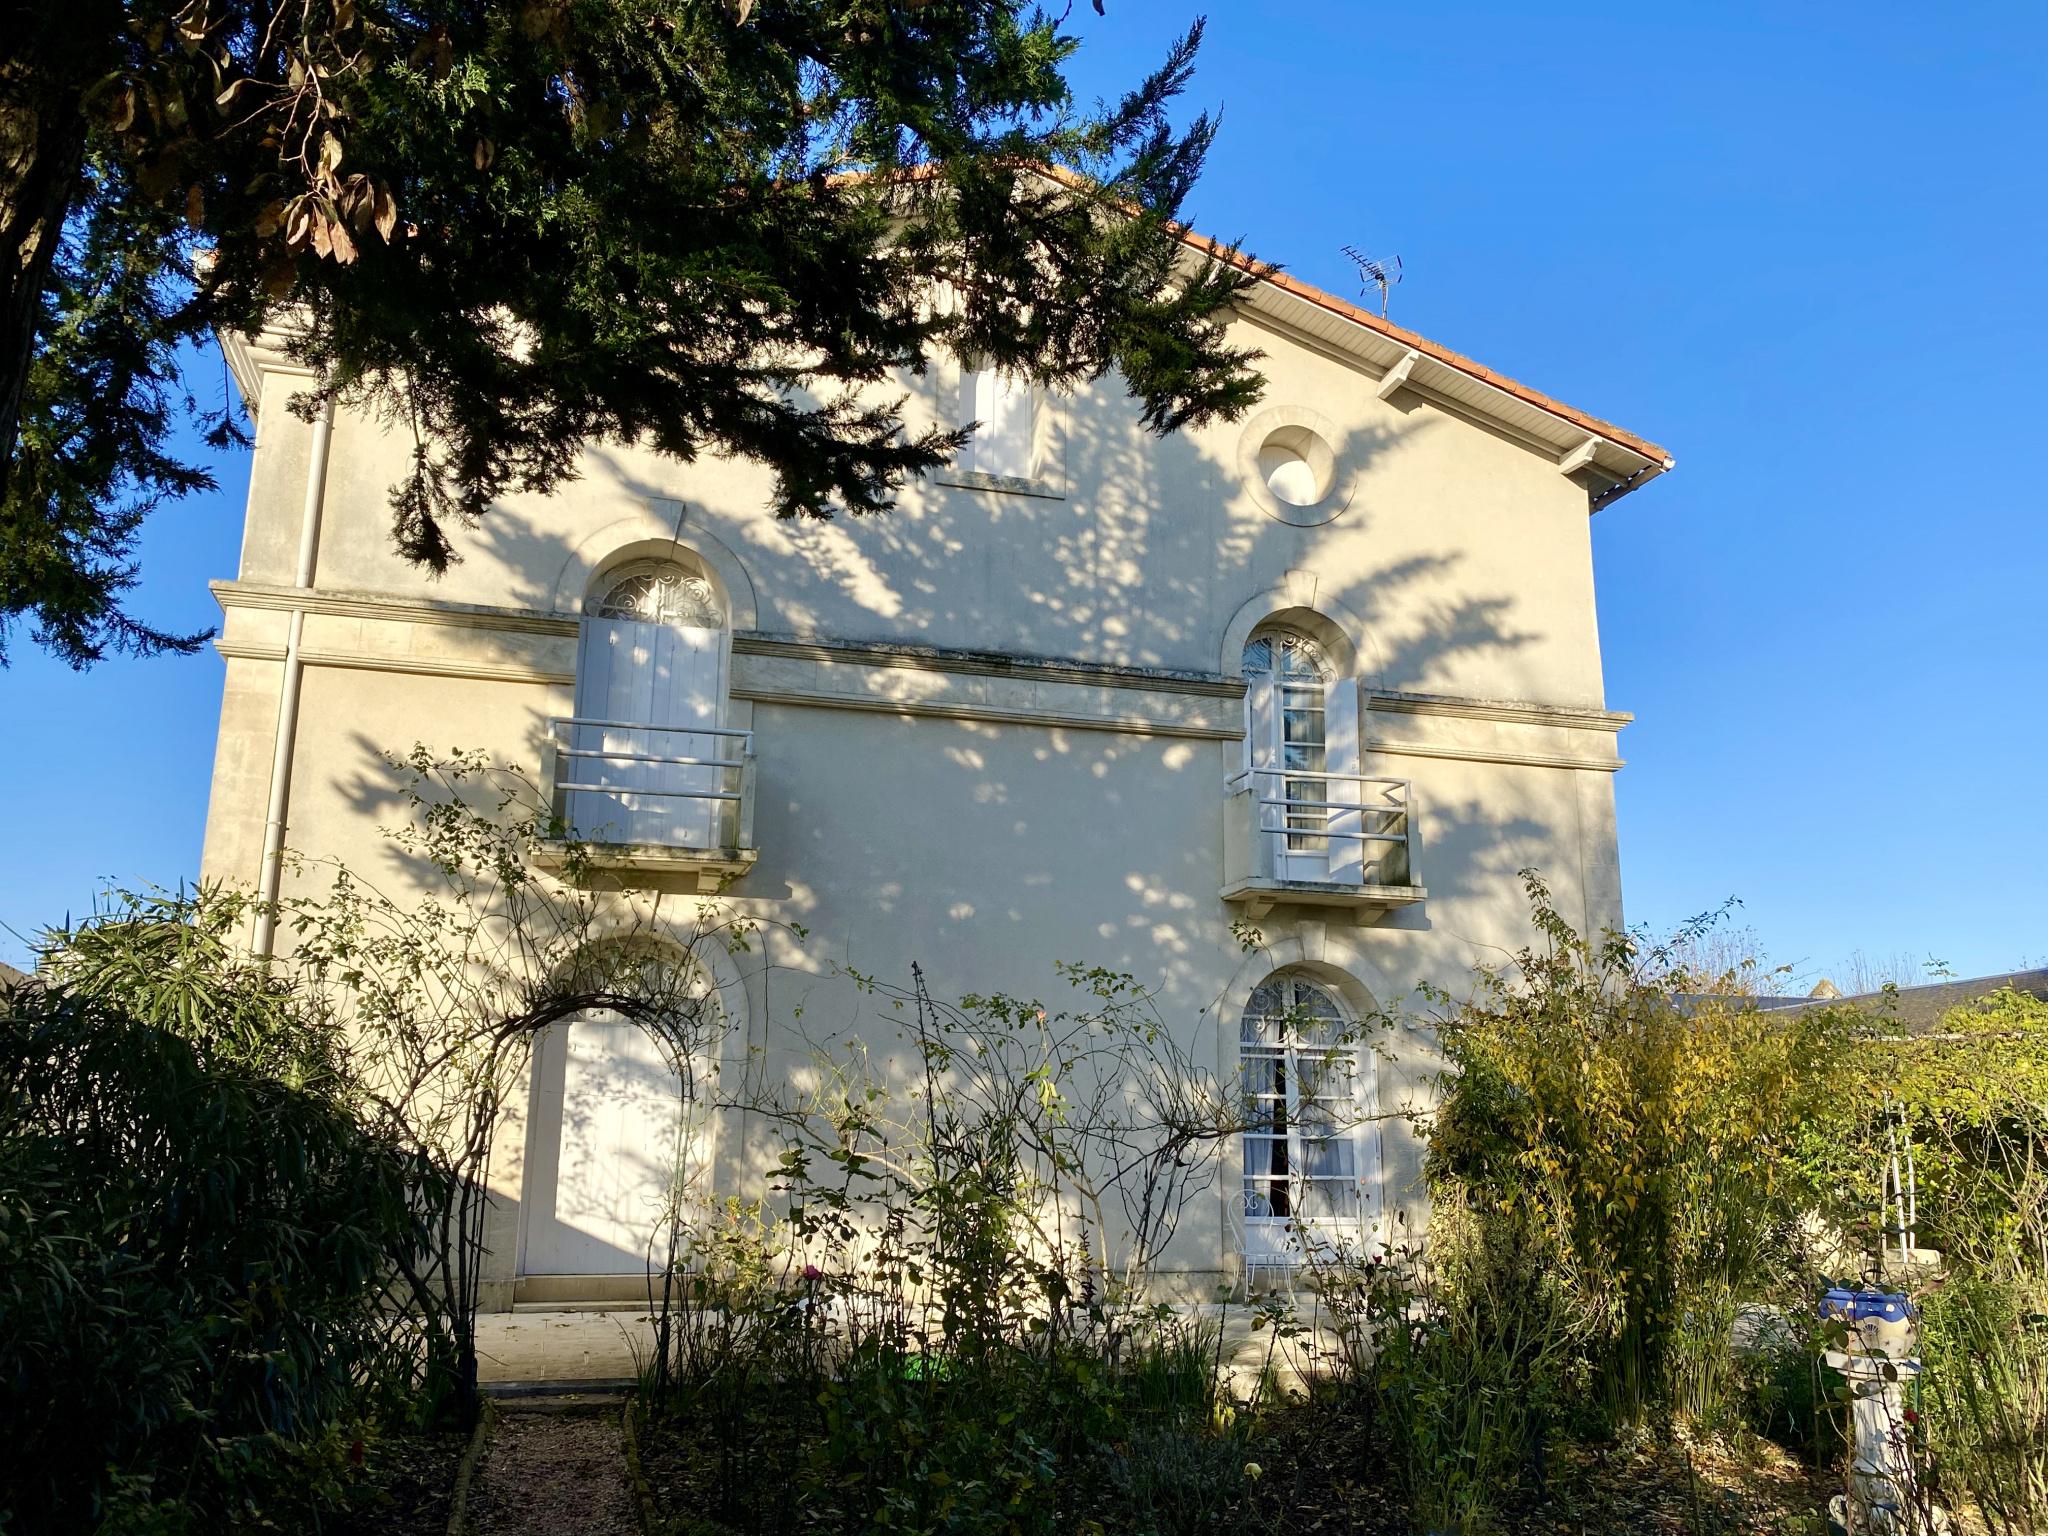 Vente Maison Bourgeoise Avec Jardin